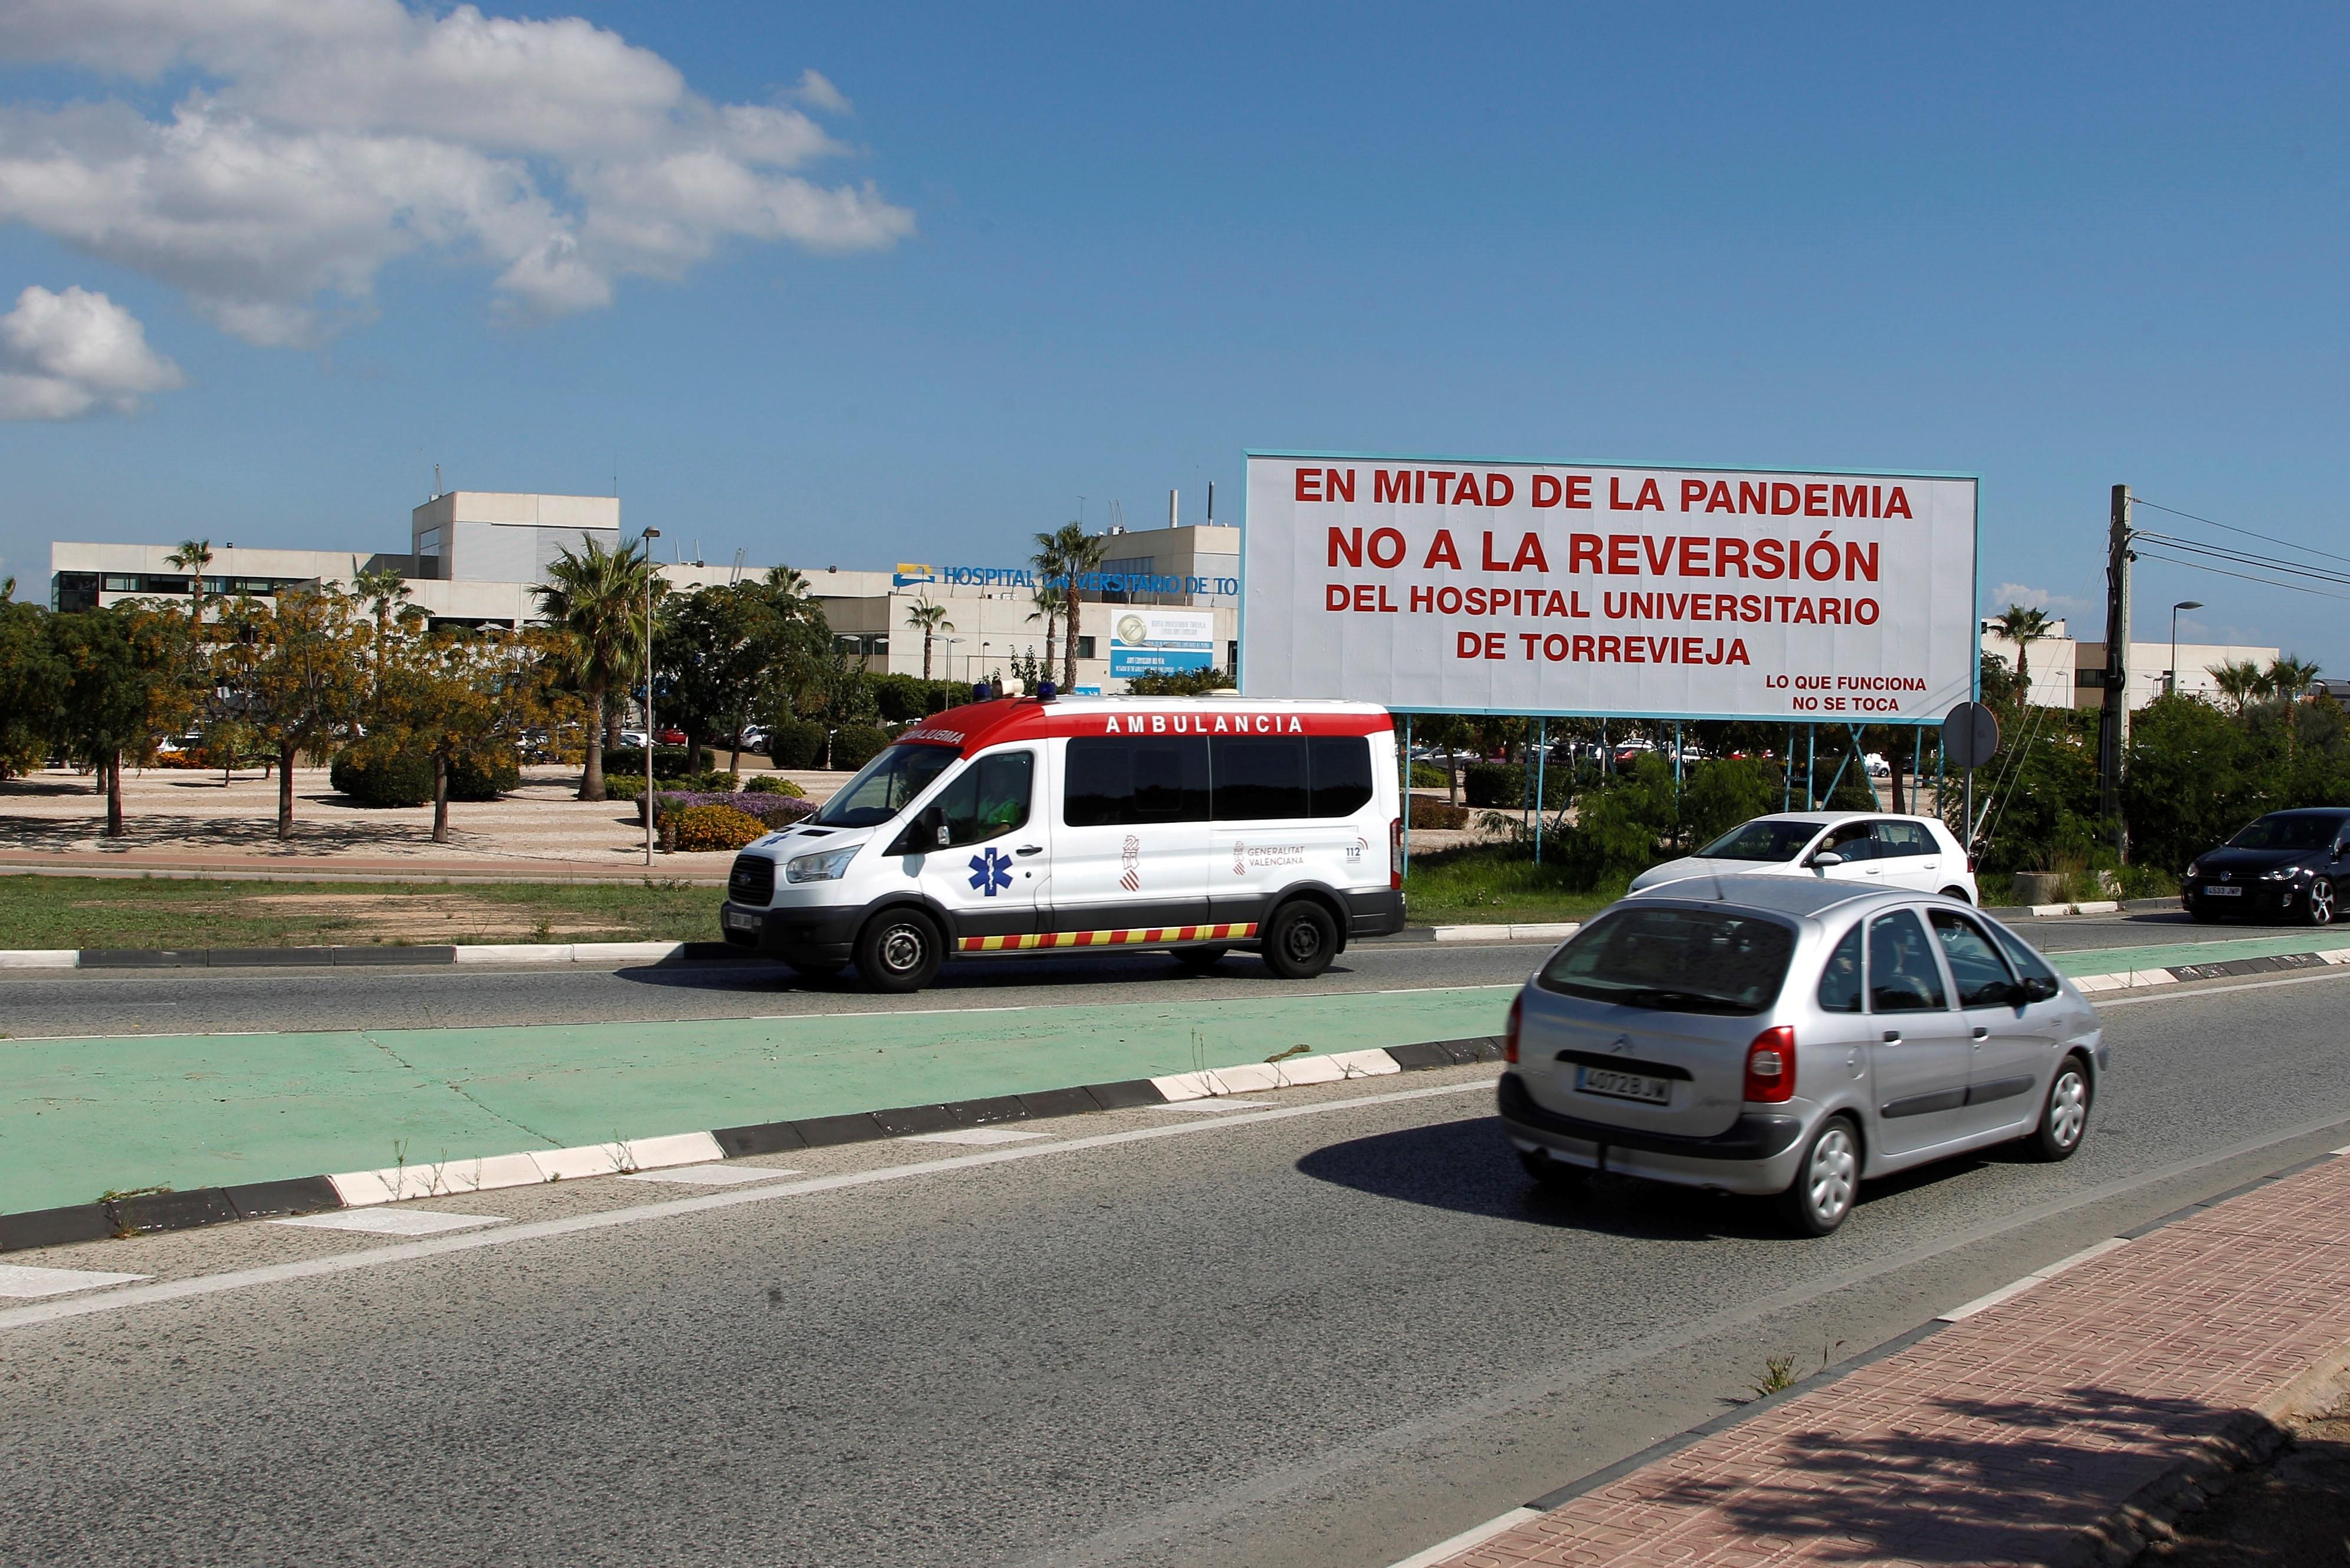 Atropello múltiple en Torrevieja, cinco jóvenes heridos por un conductor que dio positivo en alcoholemia